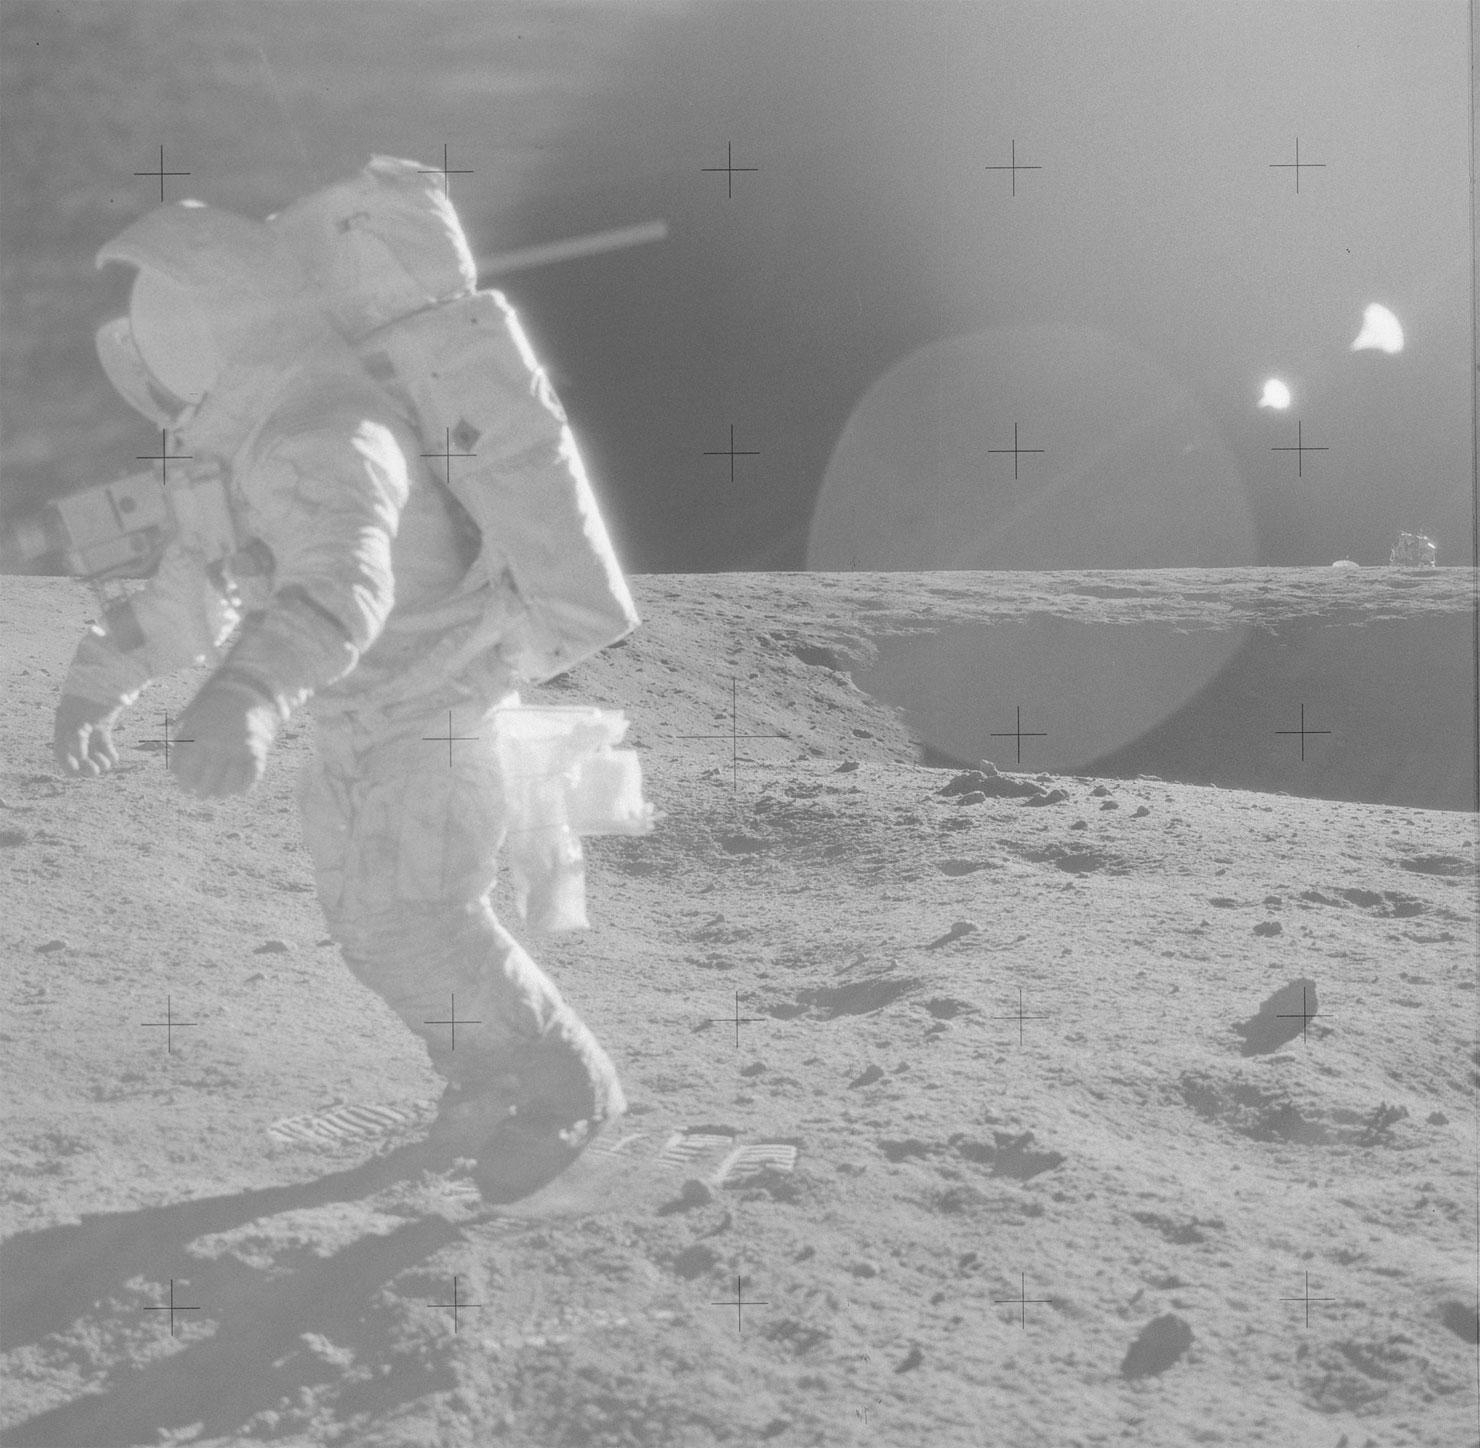 Apollon missiya foto NASA 31